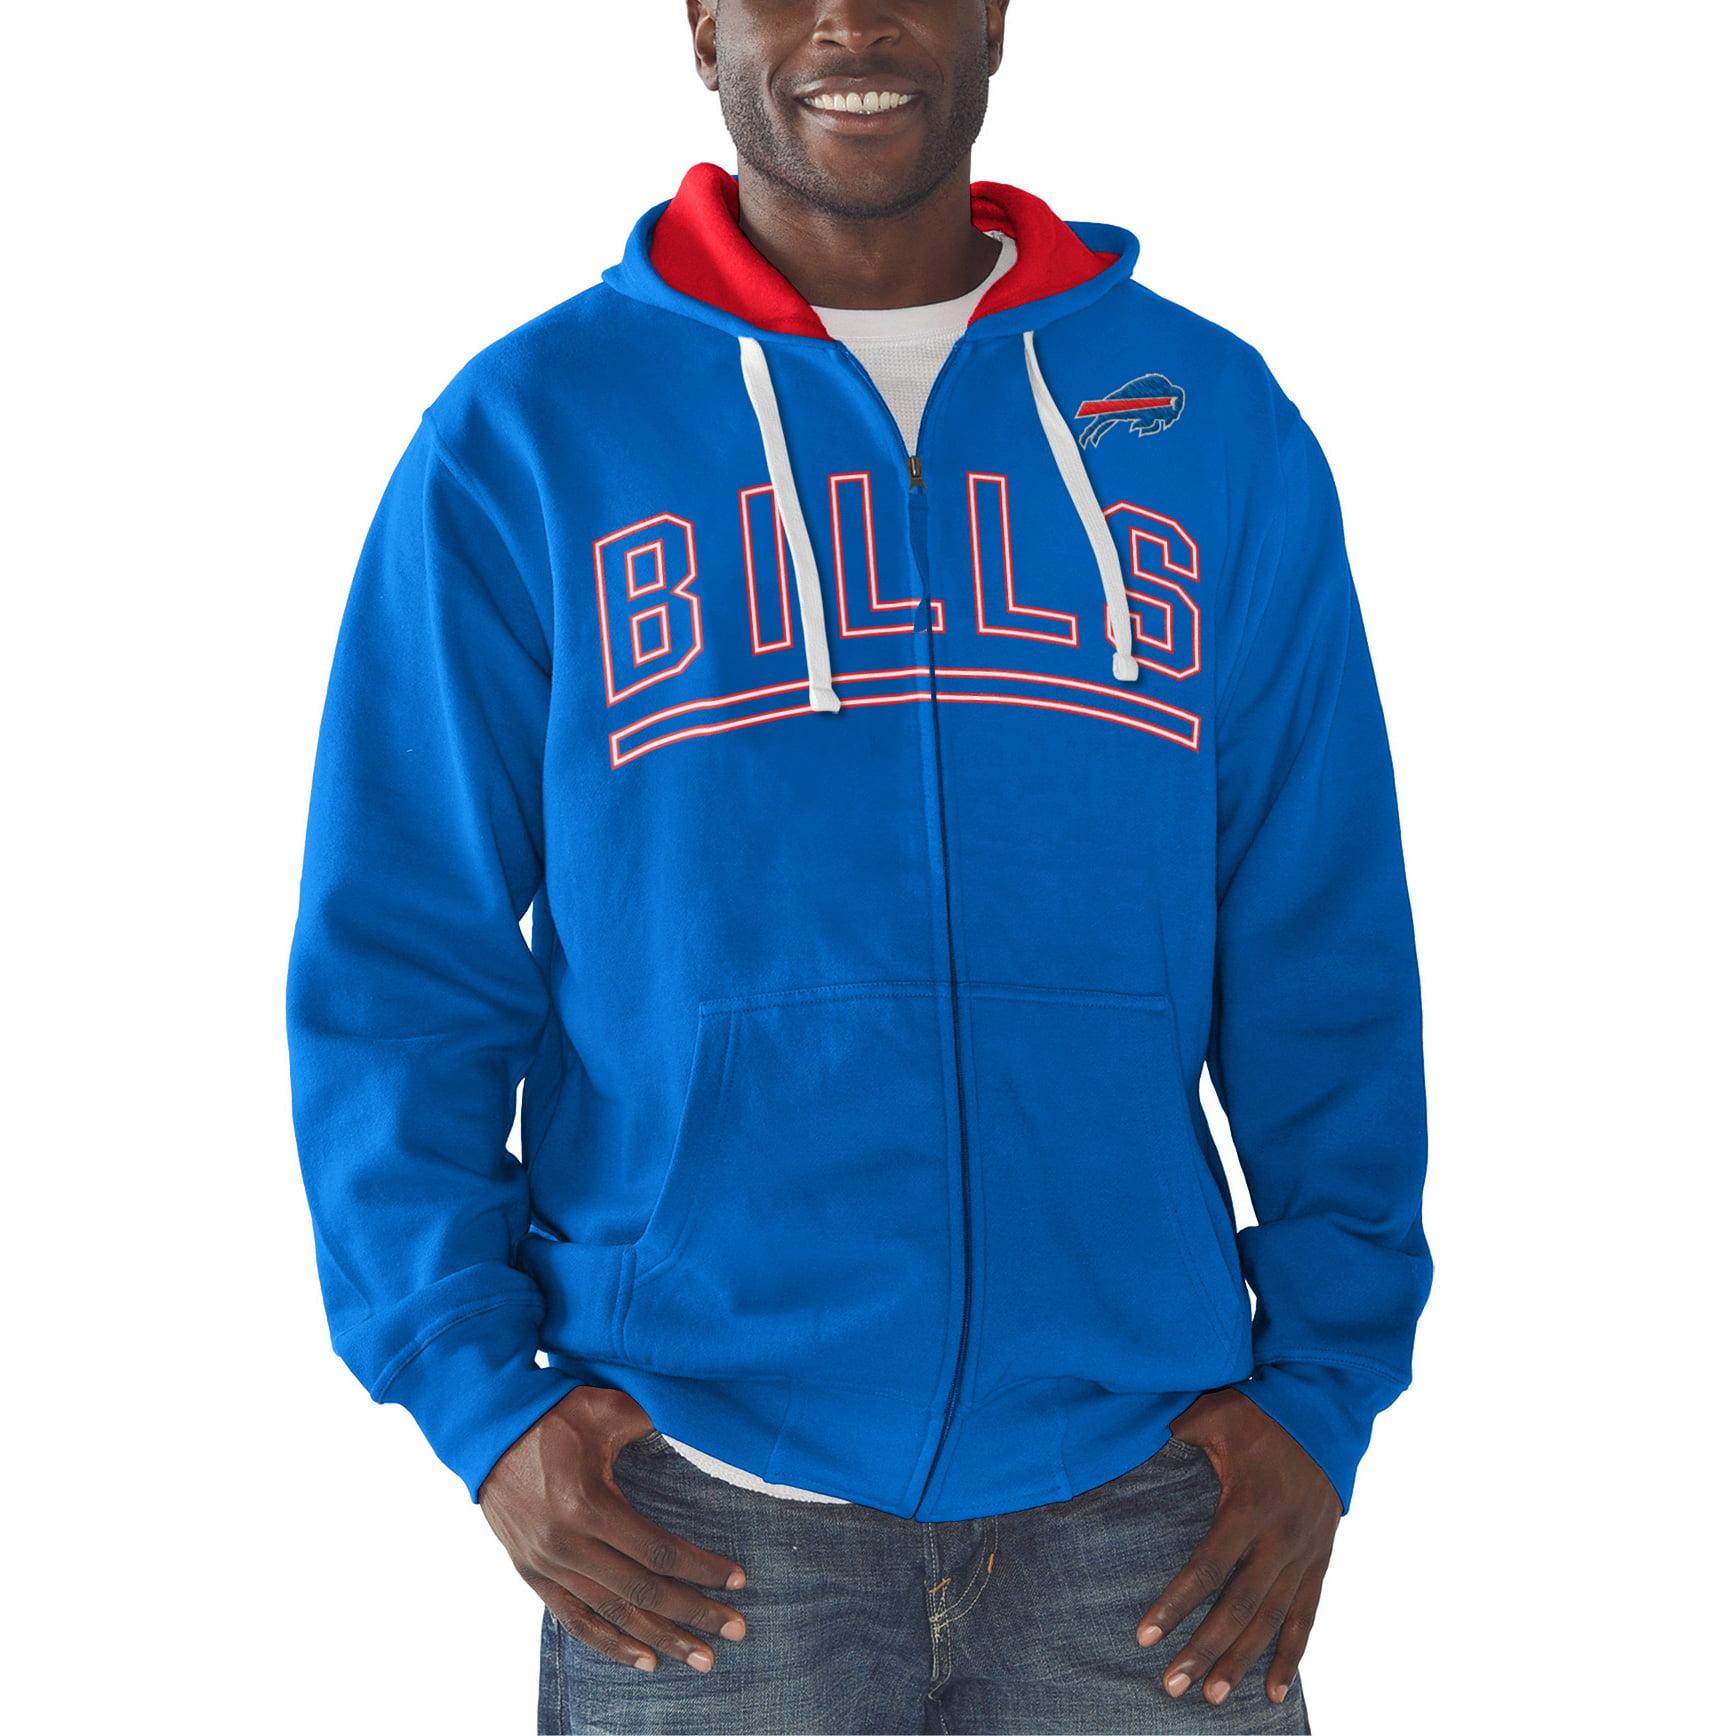 Buffalo Bills G-III Sports by Carl Banks Audible Full-Zip Fleece Hoodie - Royal